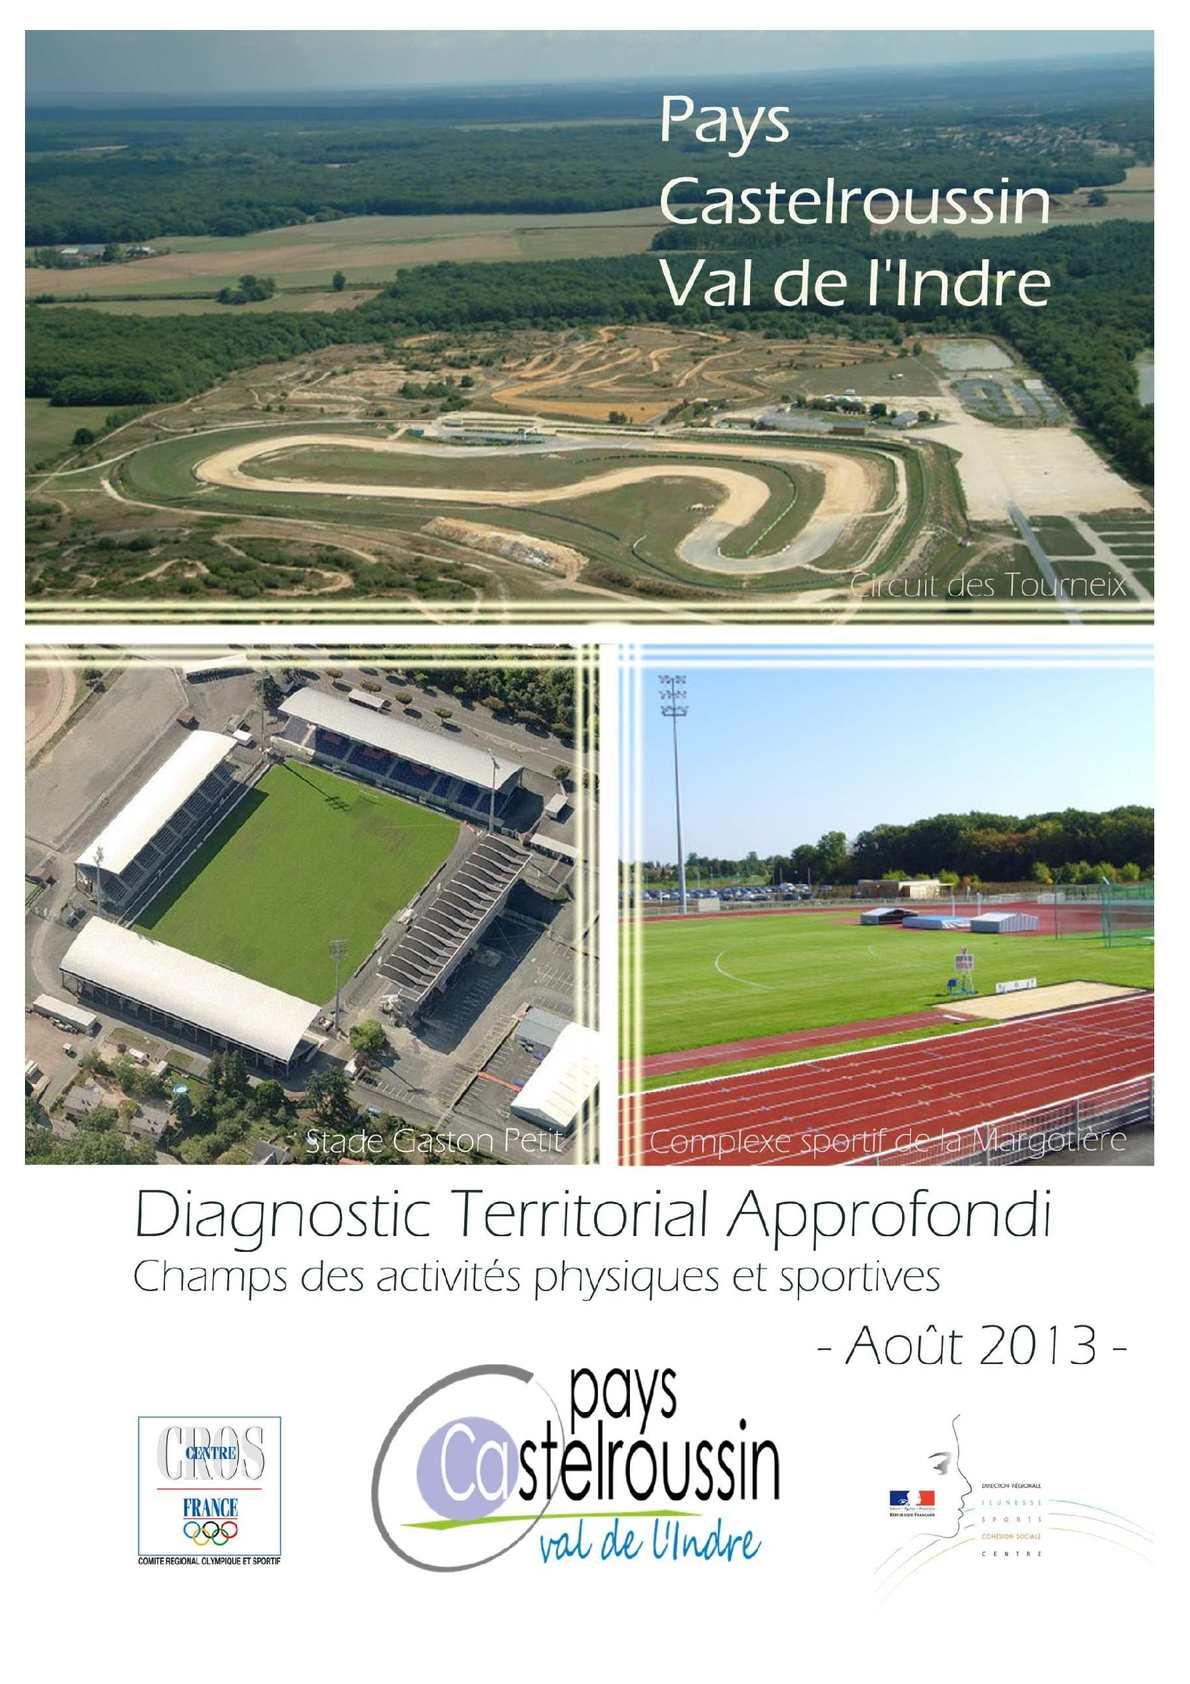 Diagnostic Territorial Sportif Approfondi Du Pays Castelroussin (2013 2014)